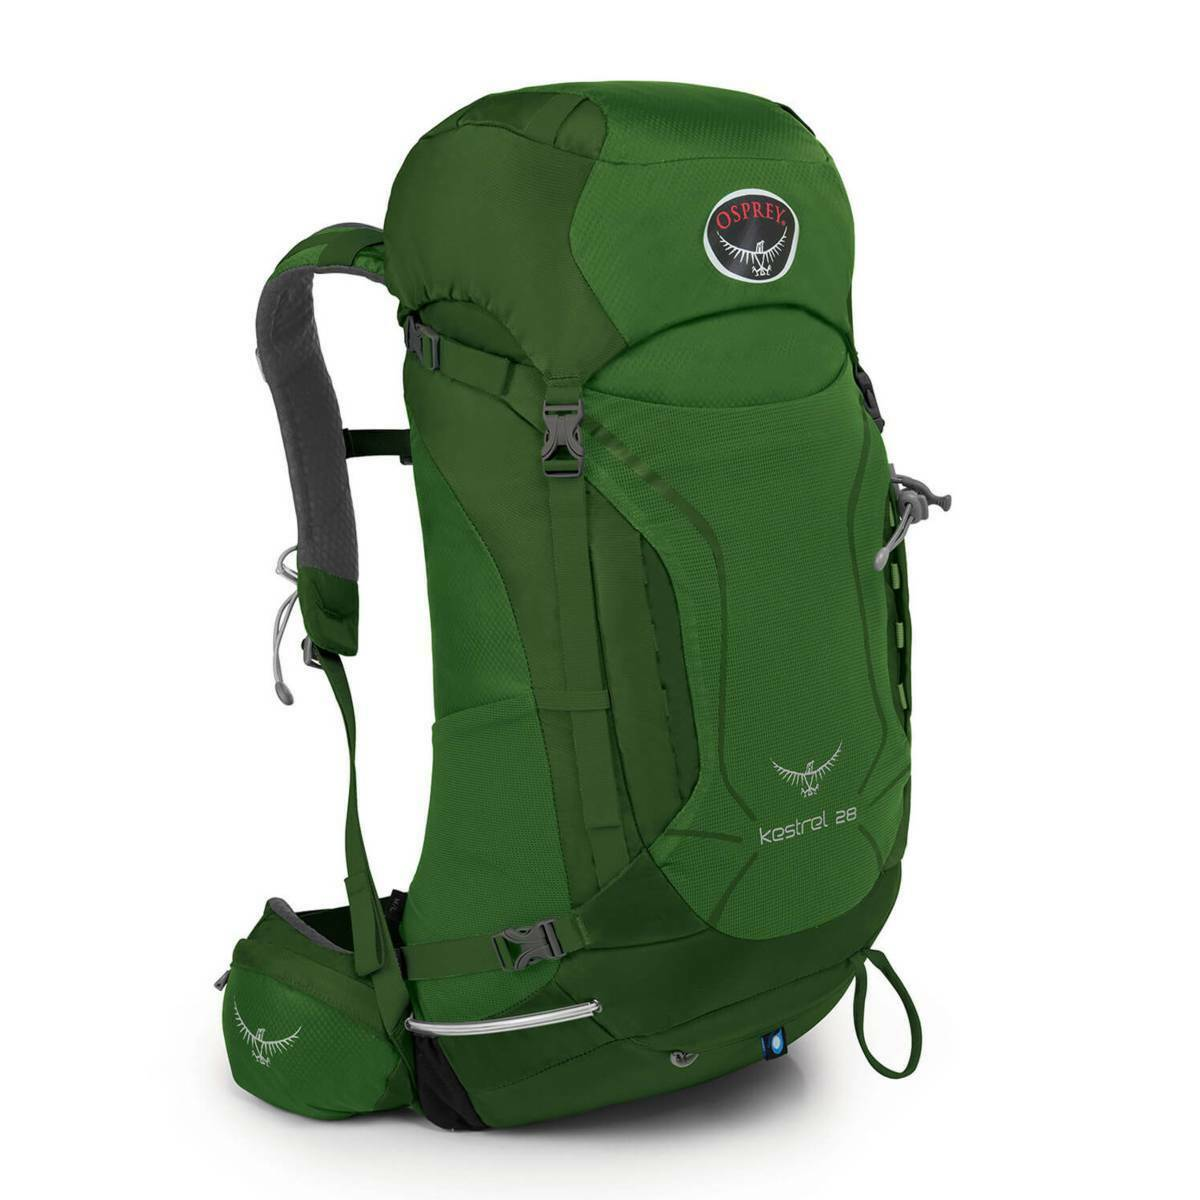 Original OSPREY Kestrel 28 Trekking-Rucksack Wander-Ruckack, NEU